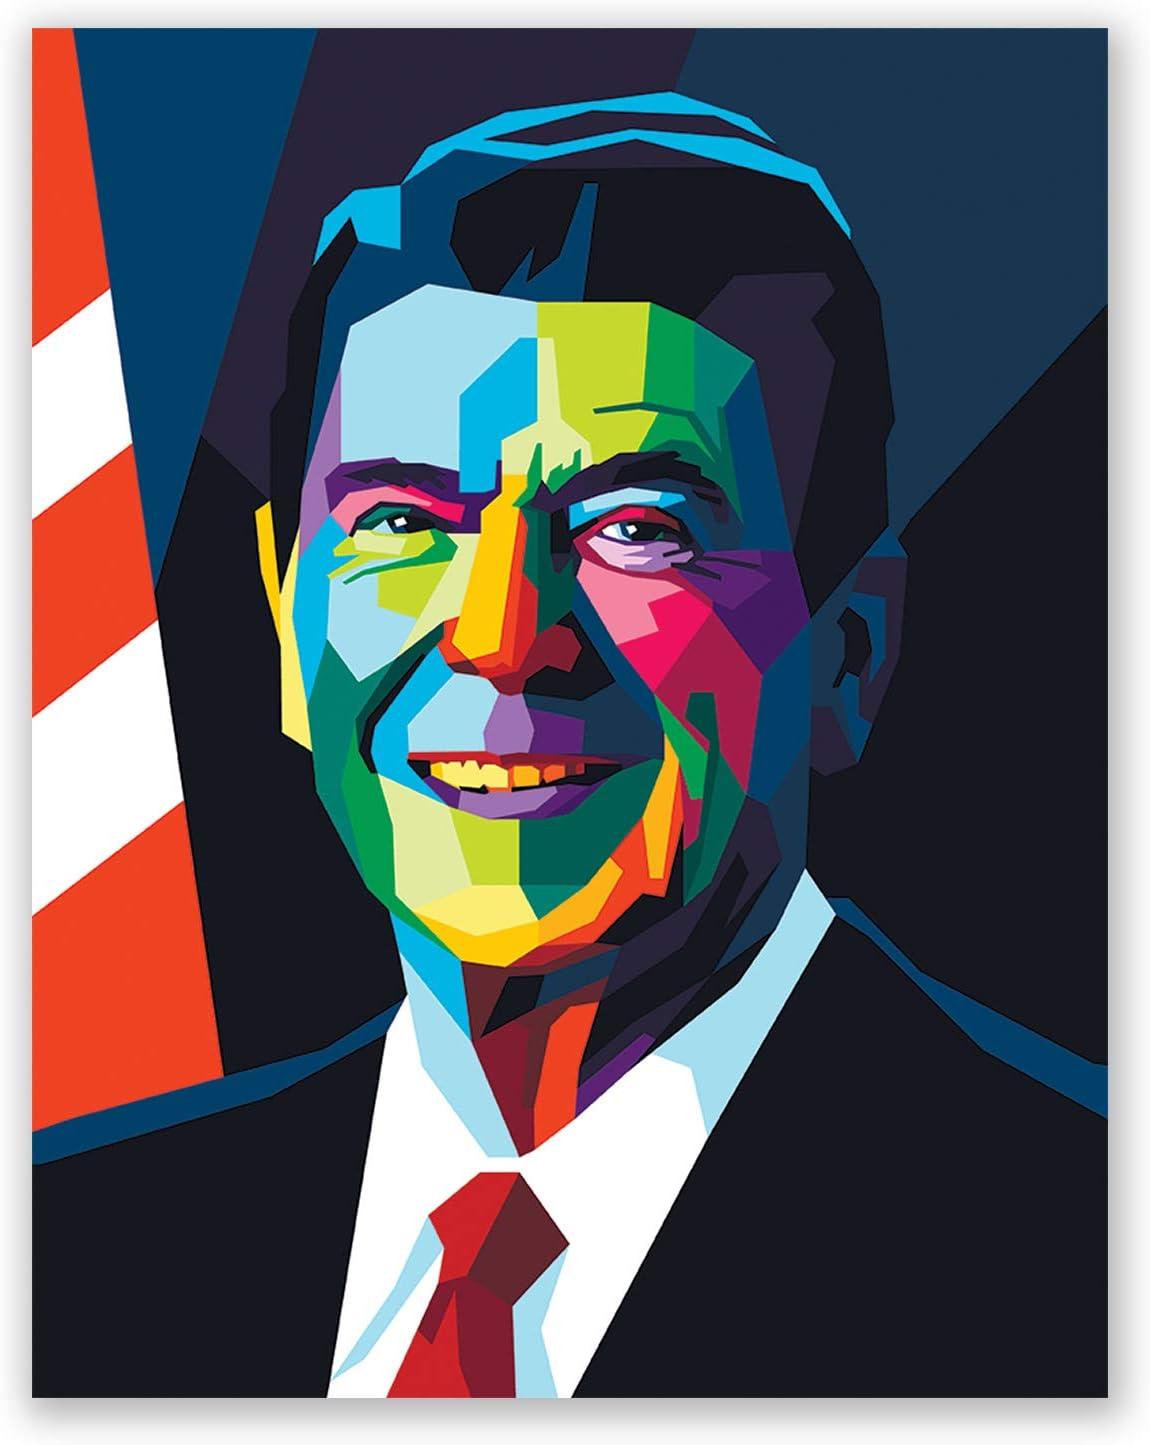 Ronald Reagan Poster - President Portrait Pop Art Style - Bedroom Home Wall Decor - Gift for Men Women (11x14)